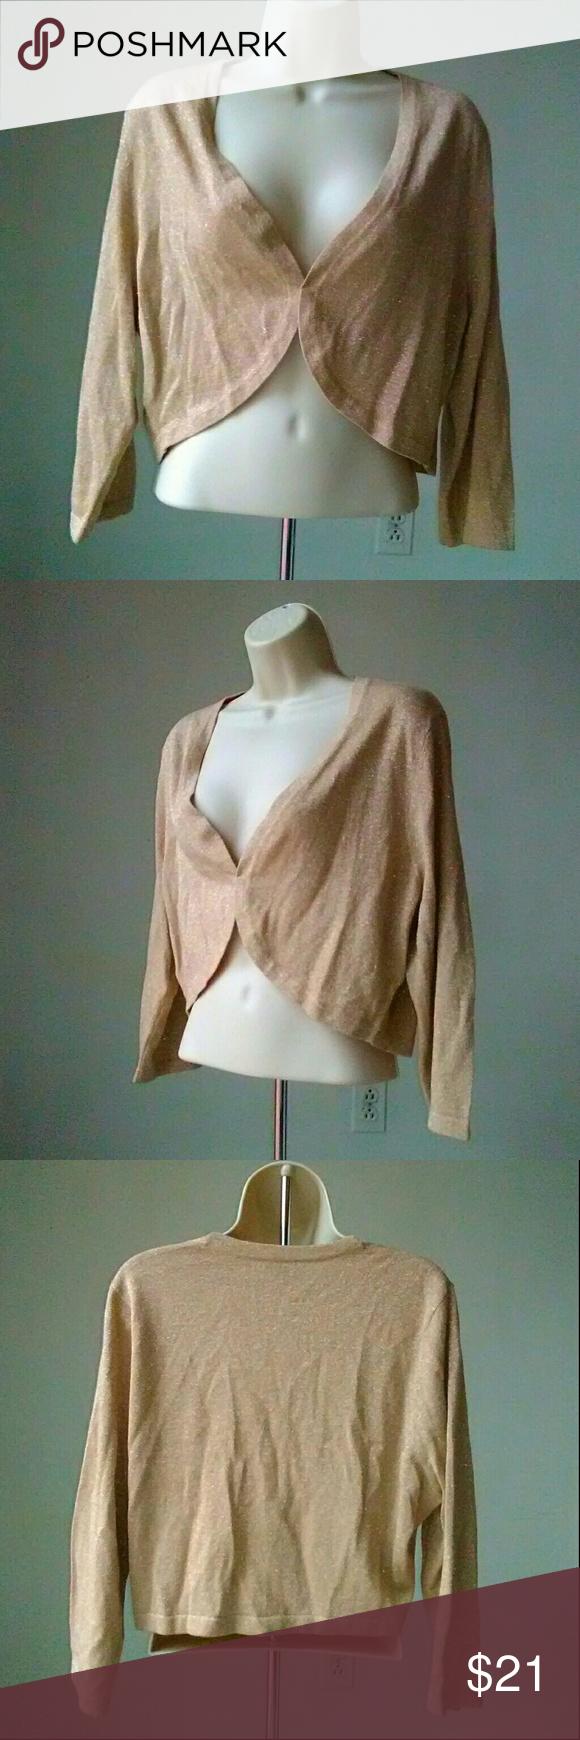 Ann Taylor Cardigan Shrug | Shrug sweater, Knit shrug and Metallic